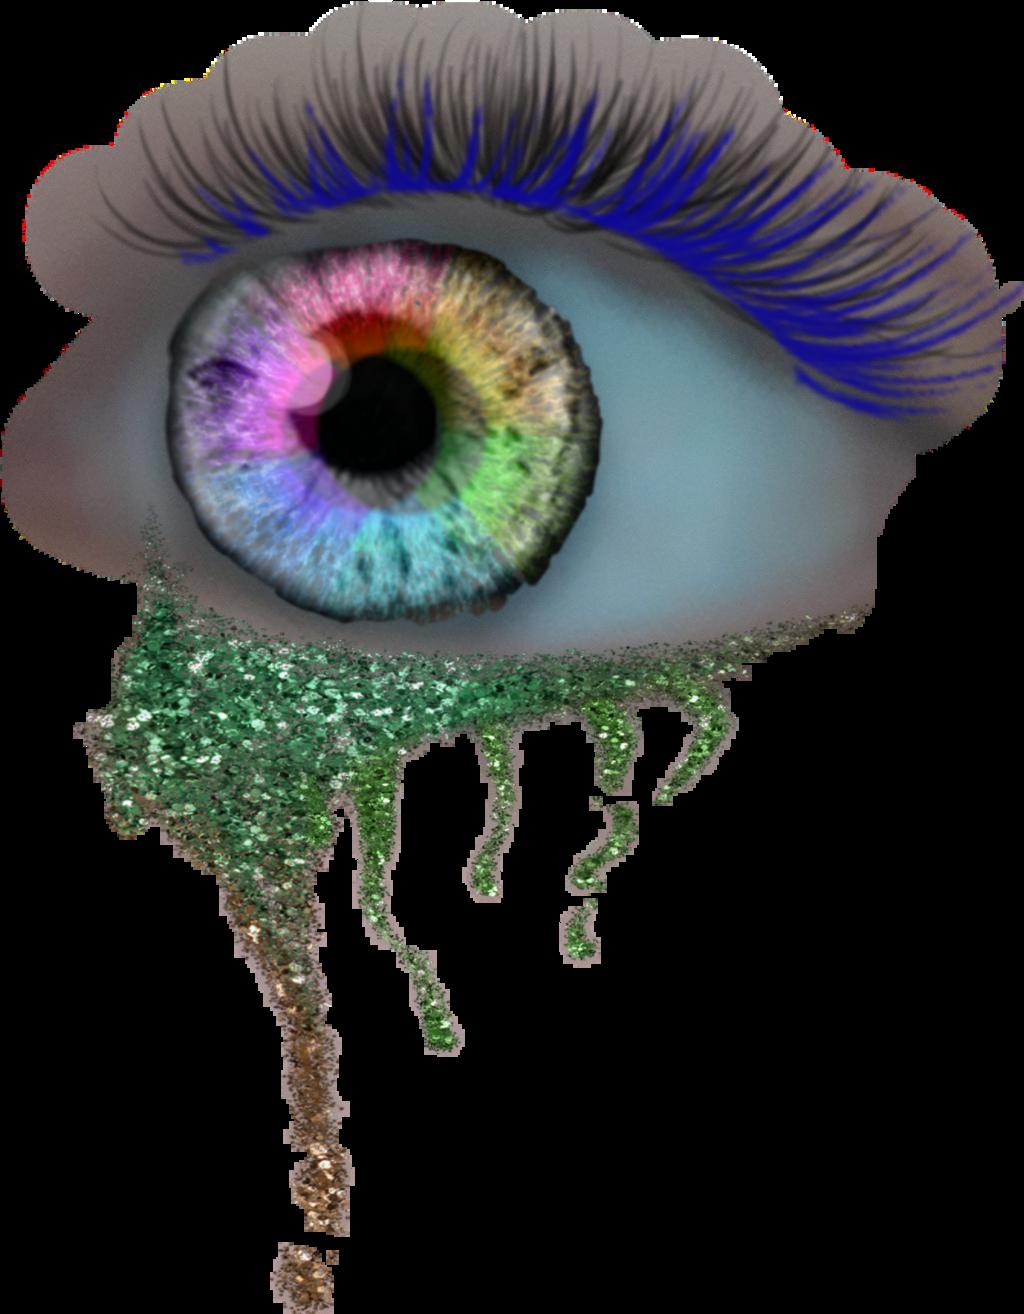 #eyesblue #eyes #raybow